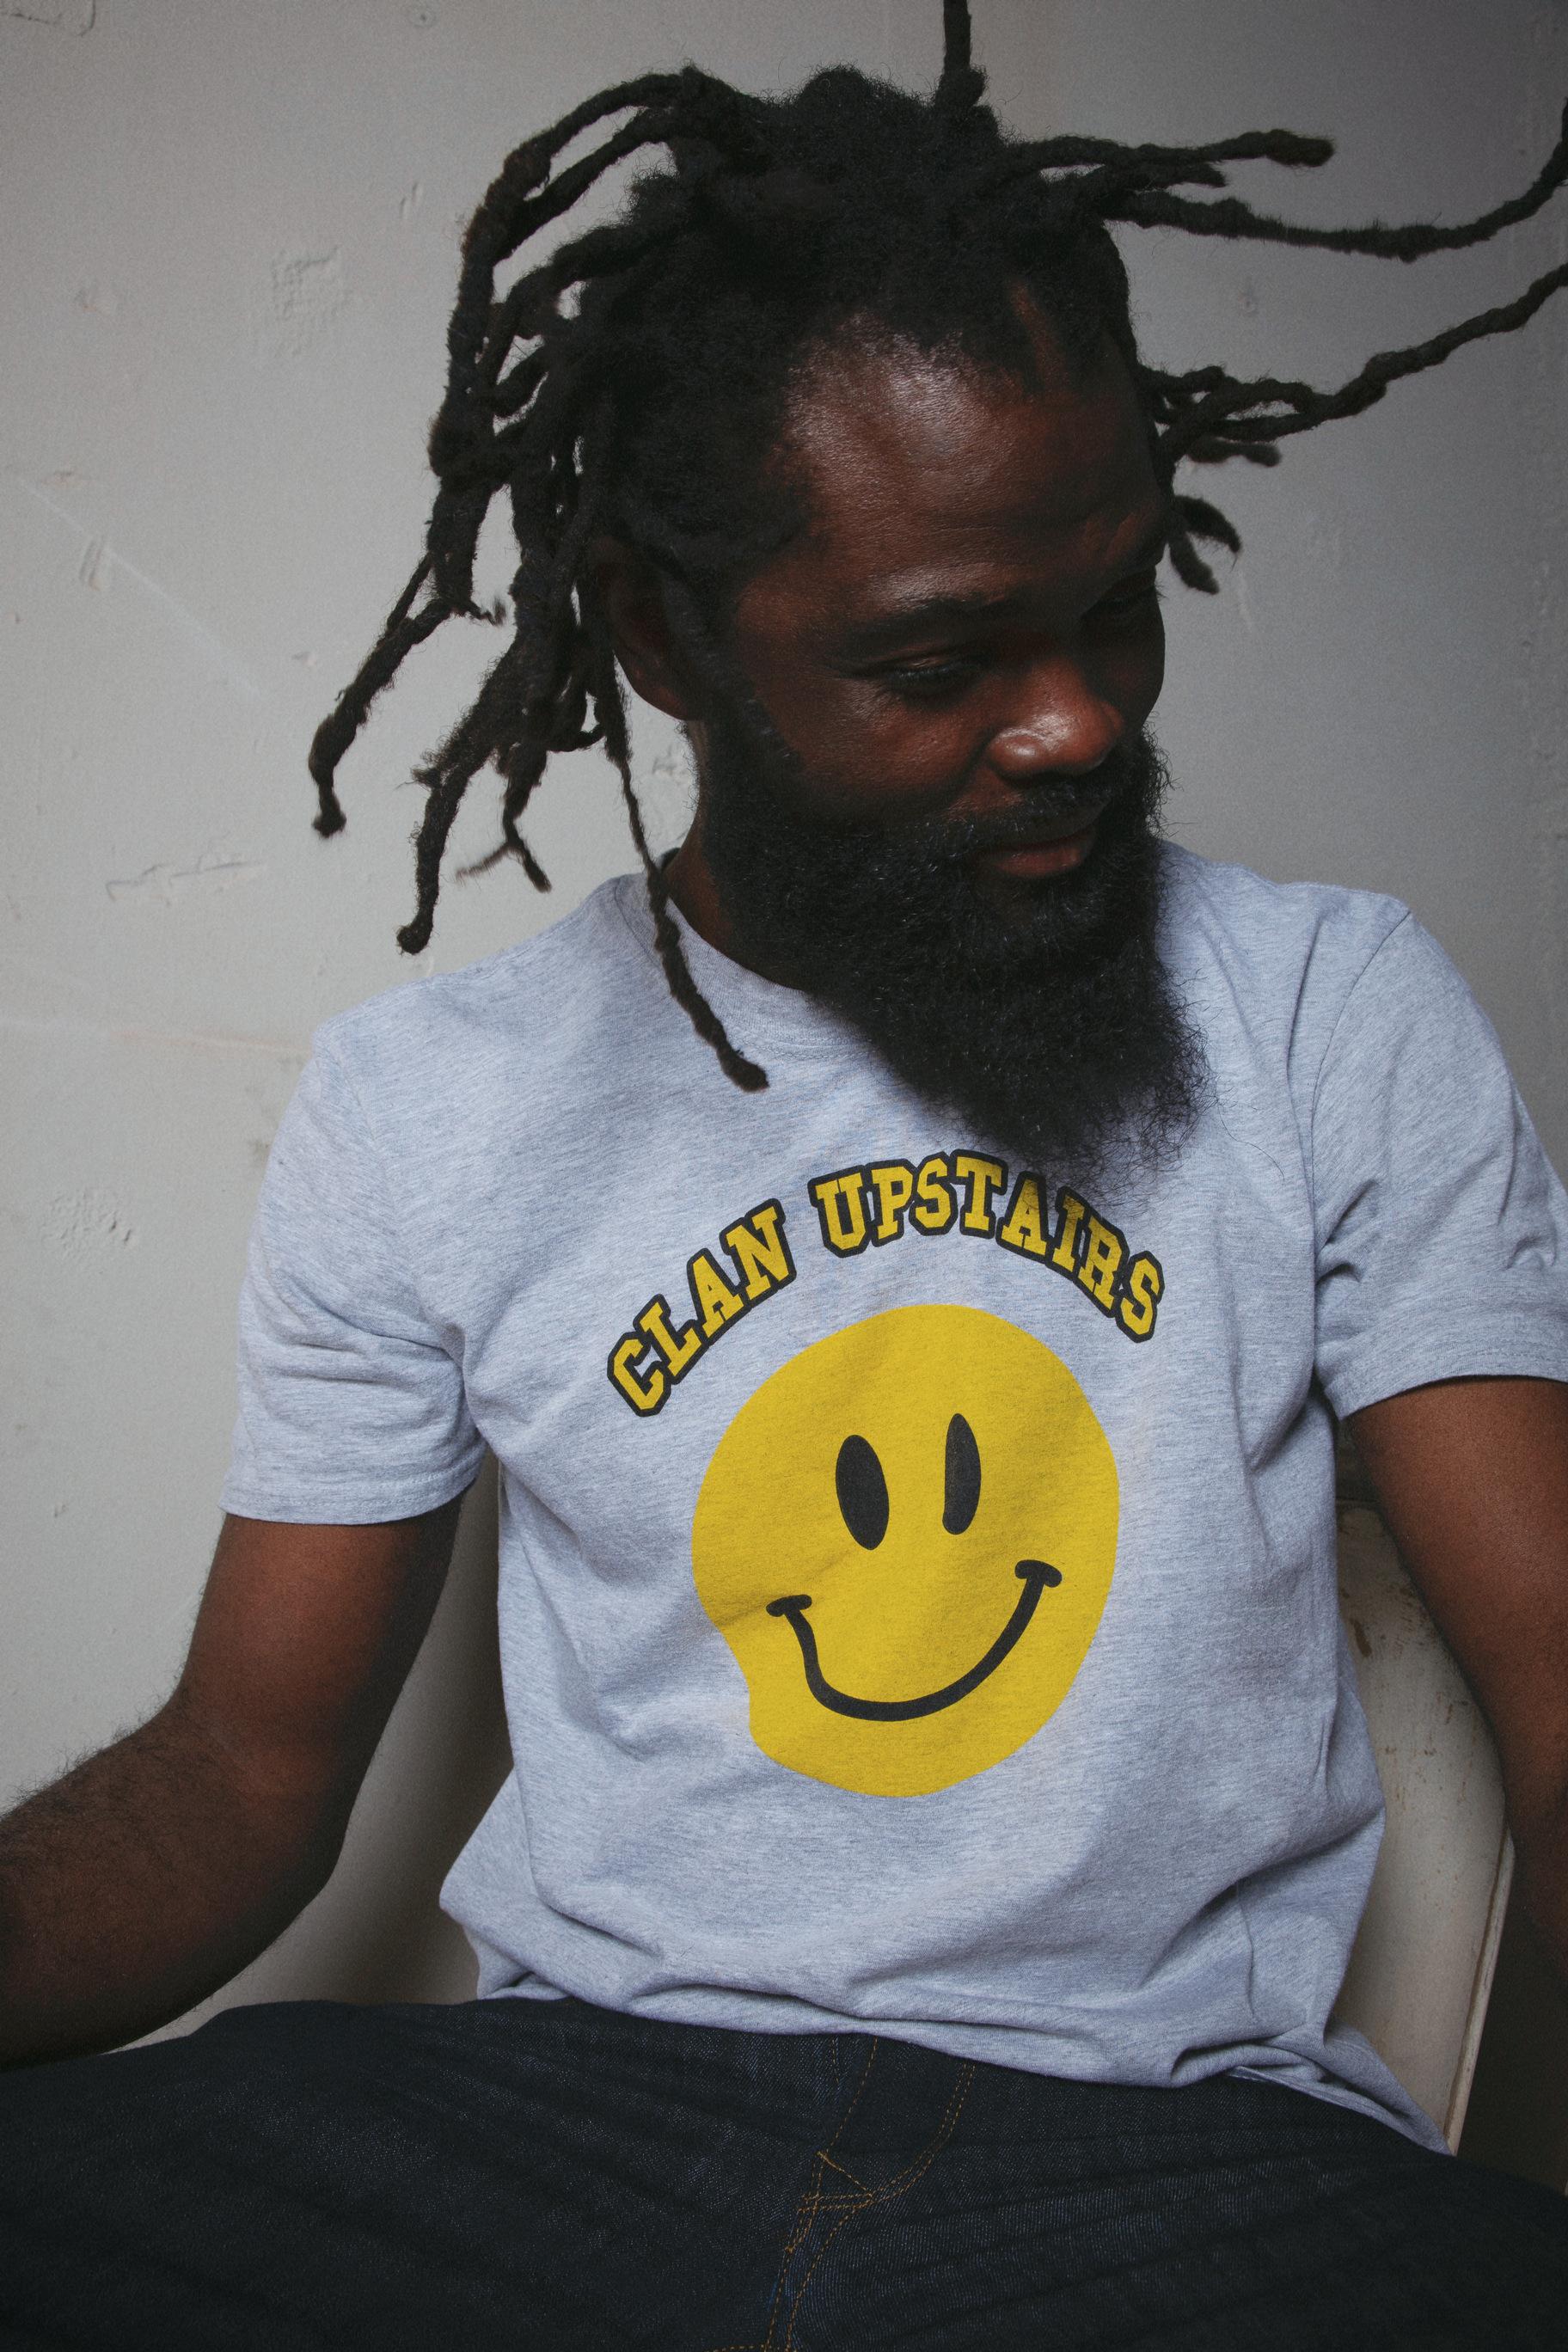 CLAN UPSTAIRS_KIND OF SMILE_POTRAIT_SS21_AKO ATIKOSSIE.jpg